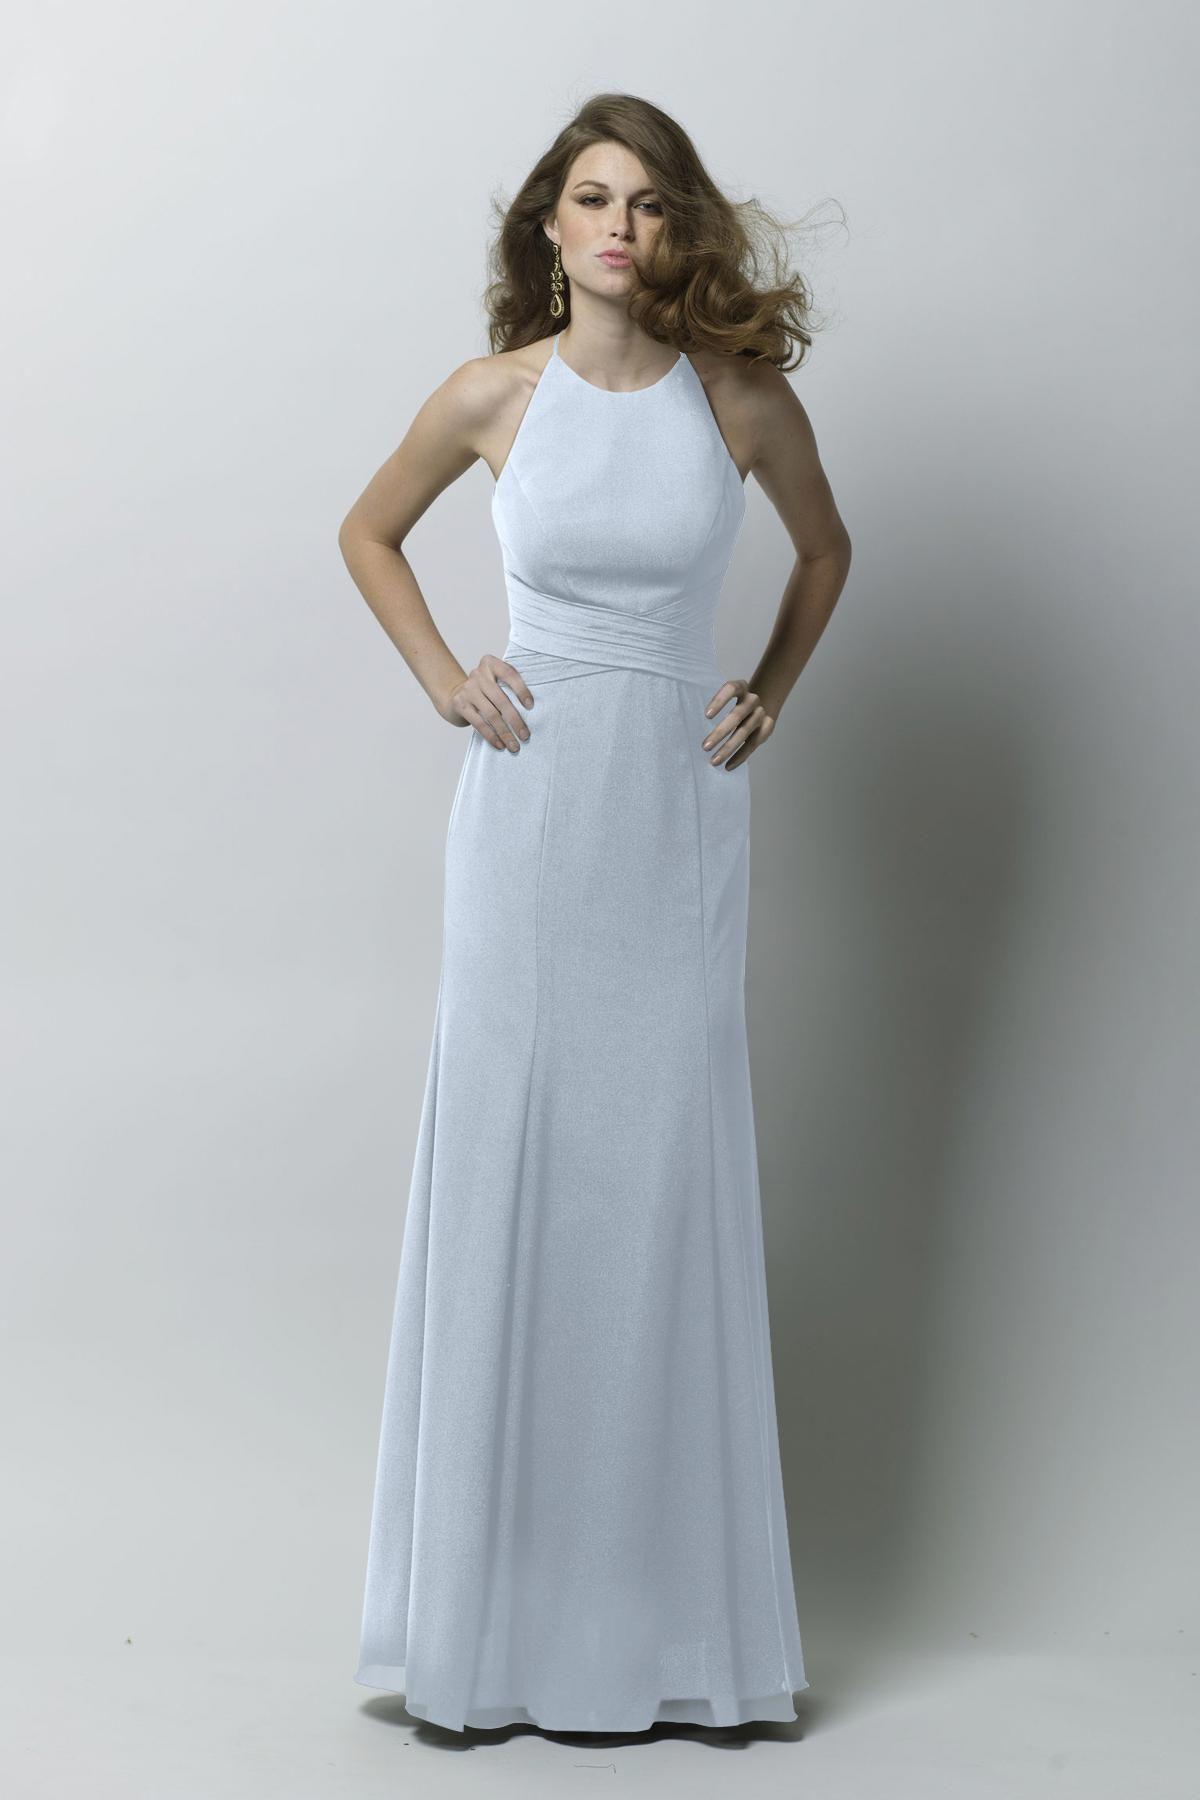 Famoso Precios De Vestido De Dama De Honor Wtoo Ideas Ornamento ...